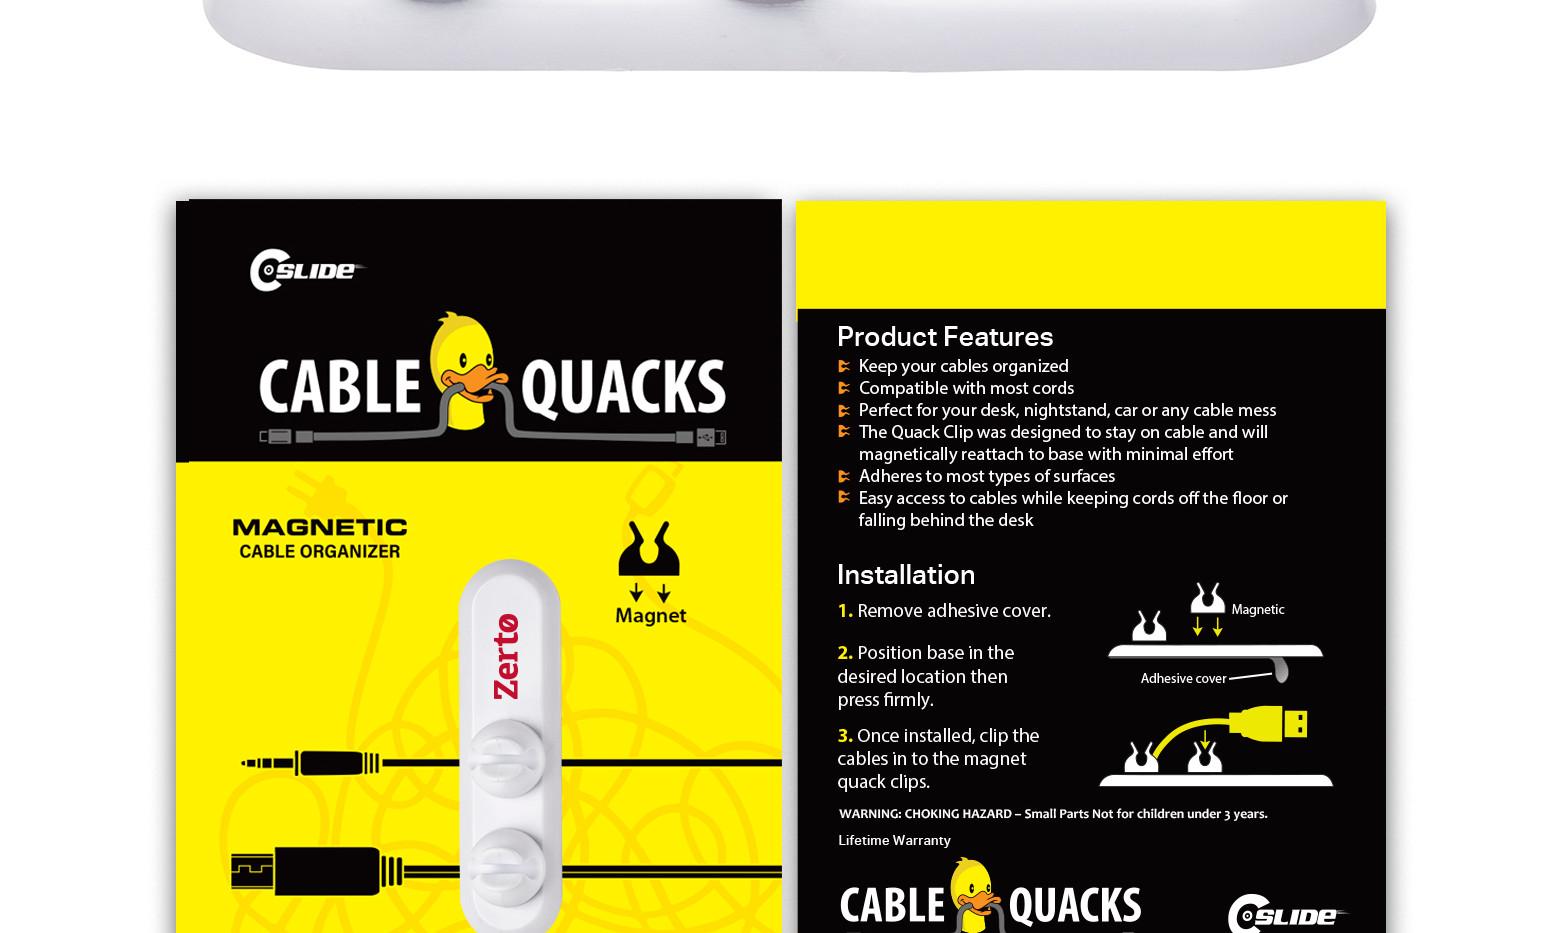 Cable quack 2 CLIP standard 4x6 WHITE.jp